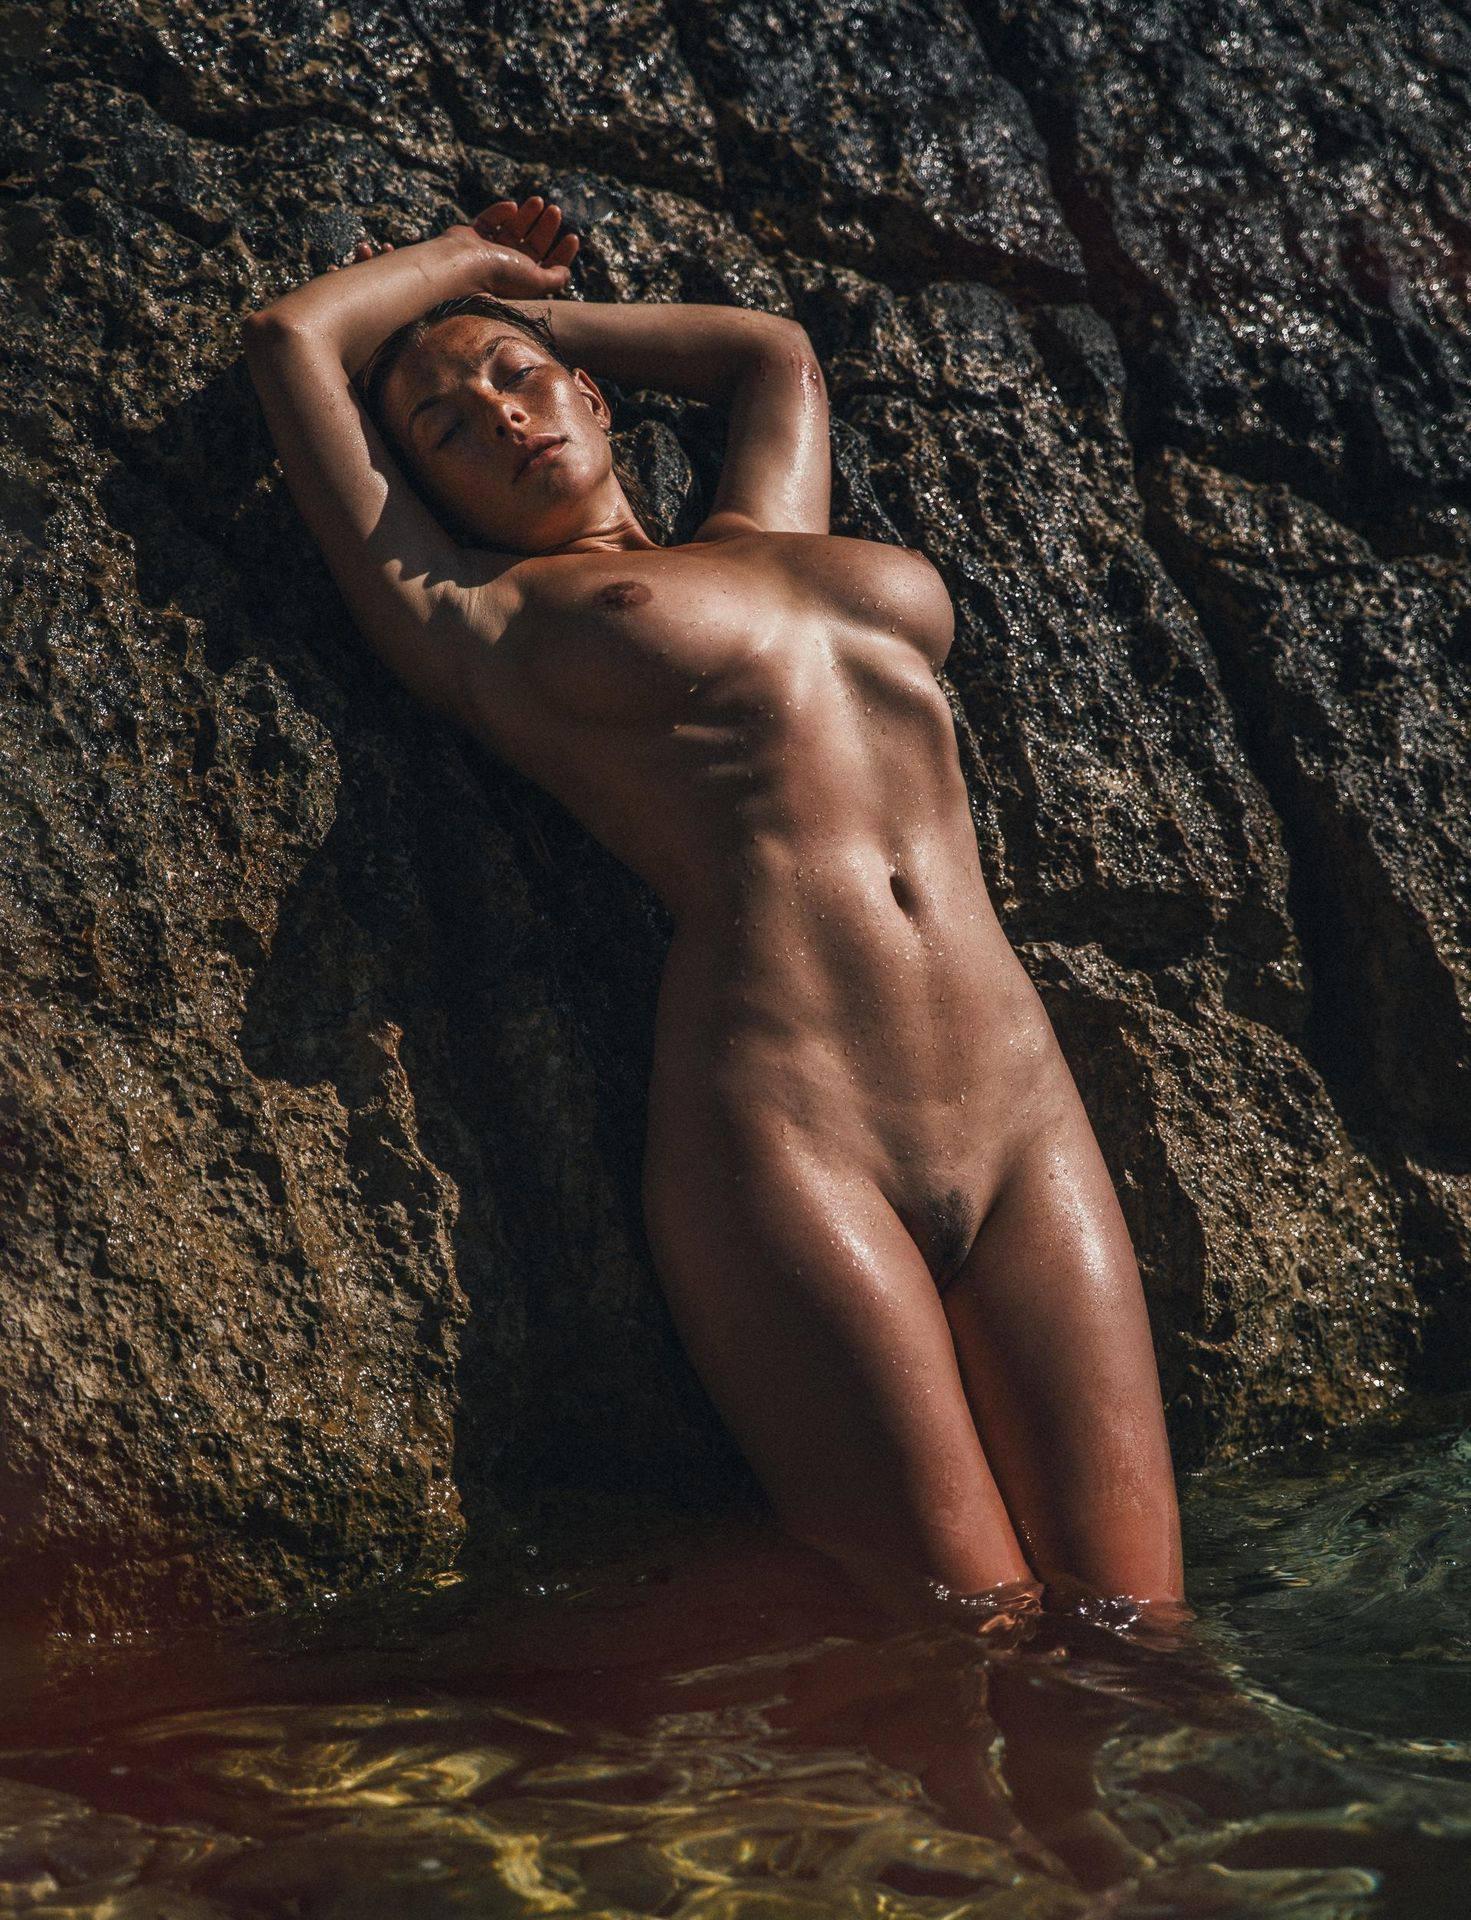 Olga Kobzar – Hot Big Boobs In Sexy Full Frontal Nude Photoshoot By Thomas Agatz (nsfw) 0004